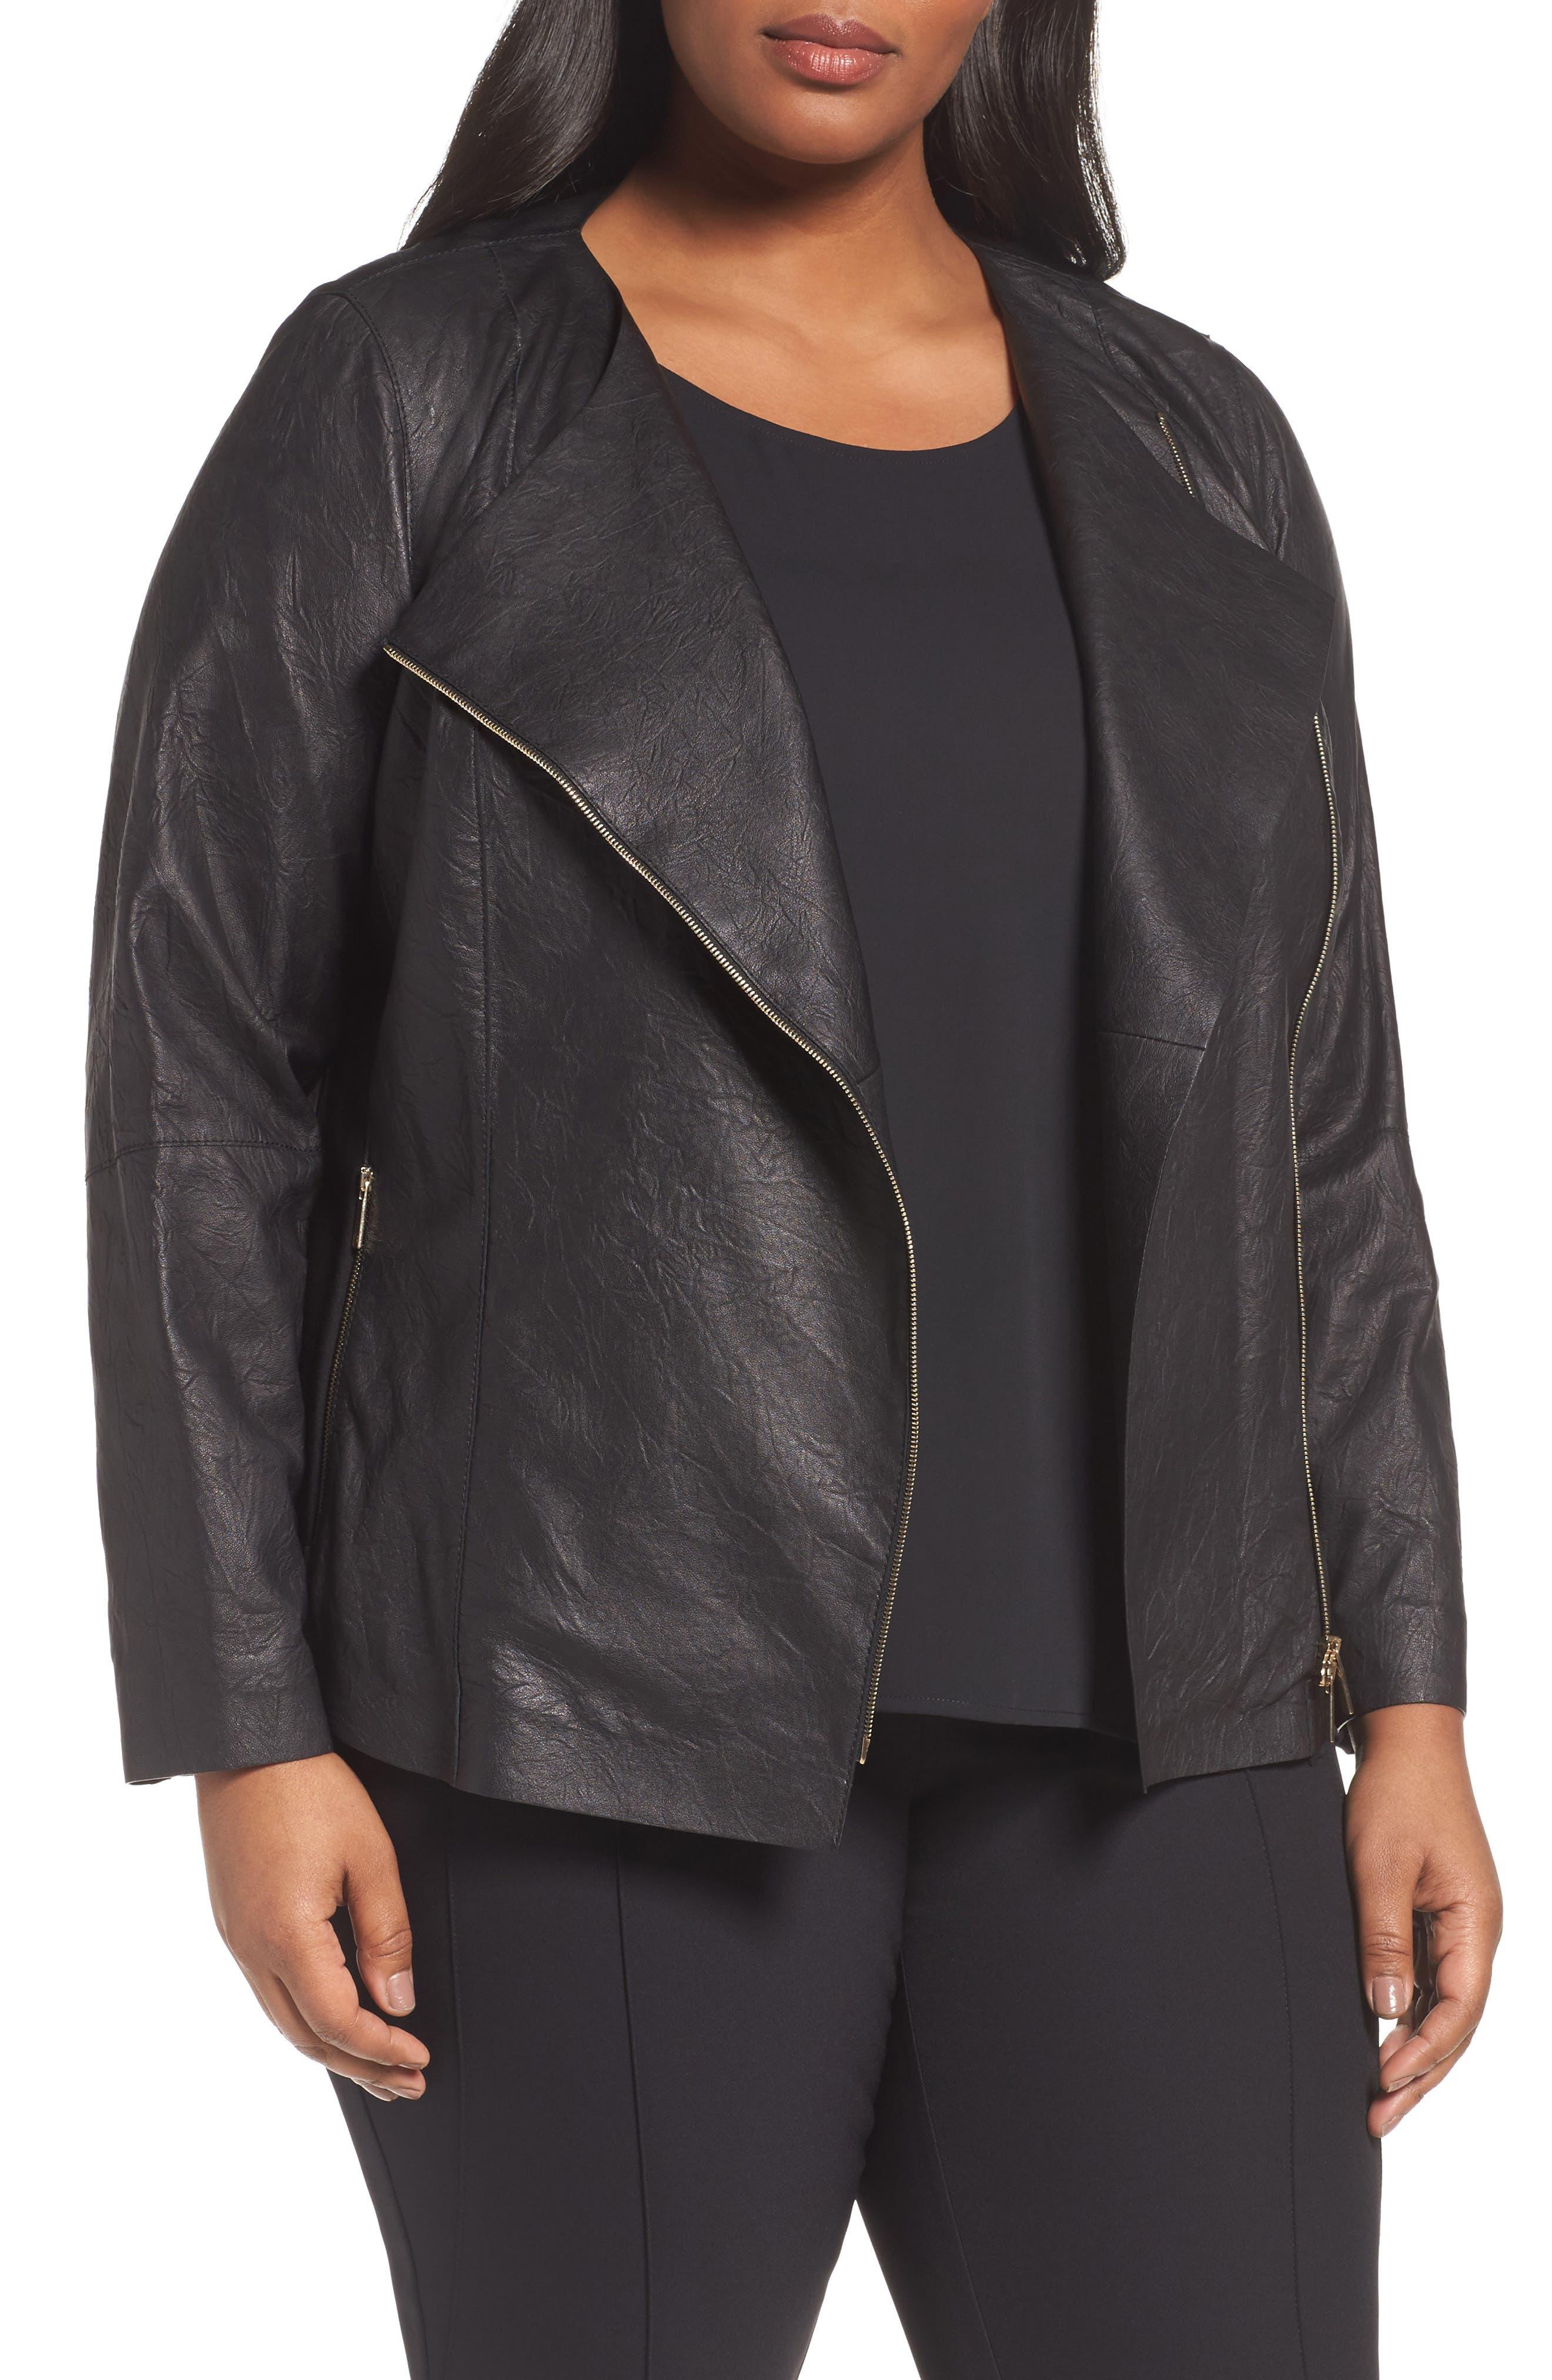 Aimes Leather Jacket,                             Main thumbnail 1, color,                             Black